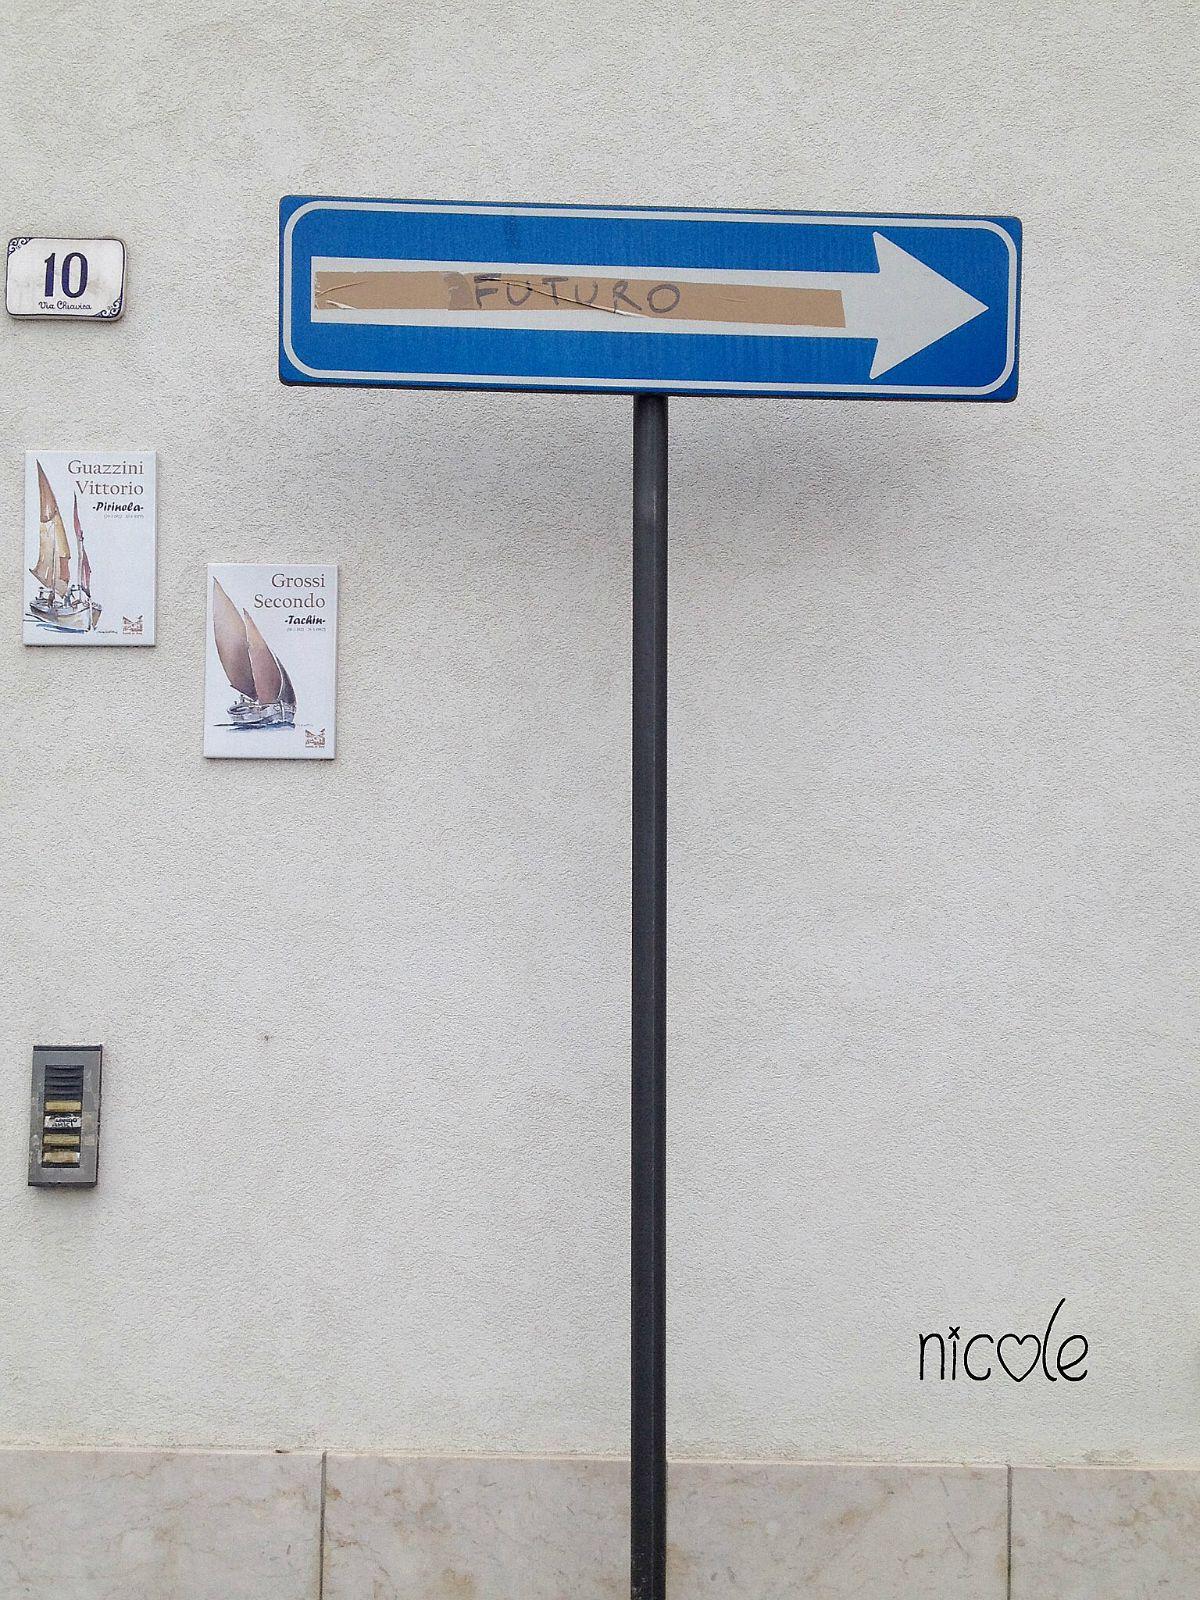 Futuro. Future. Rimini. Streets. Italy